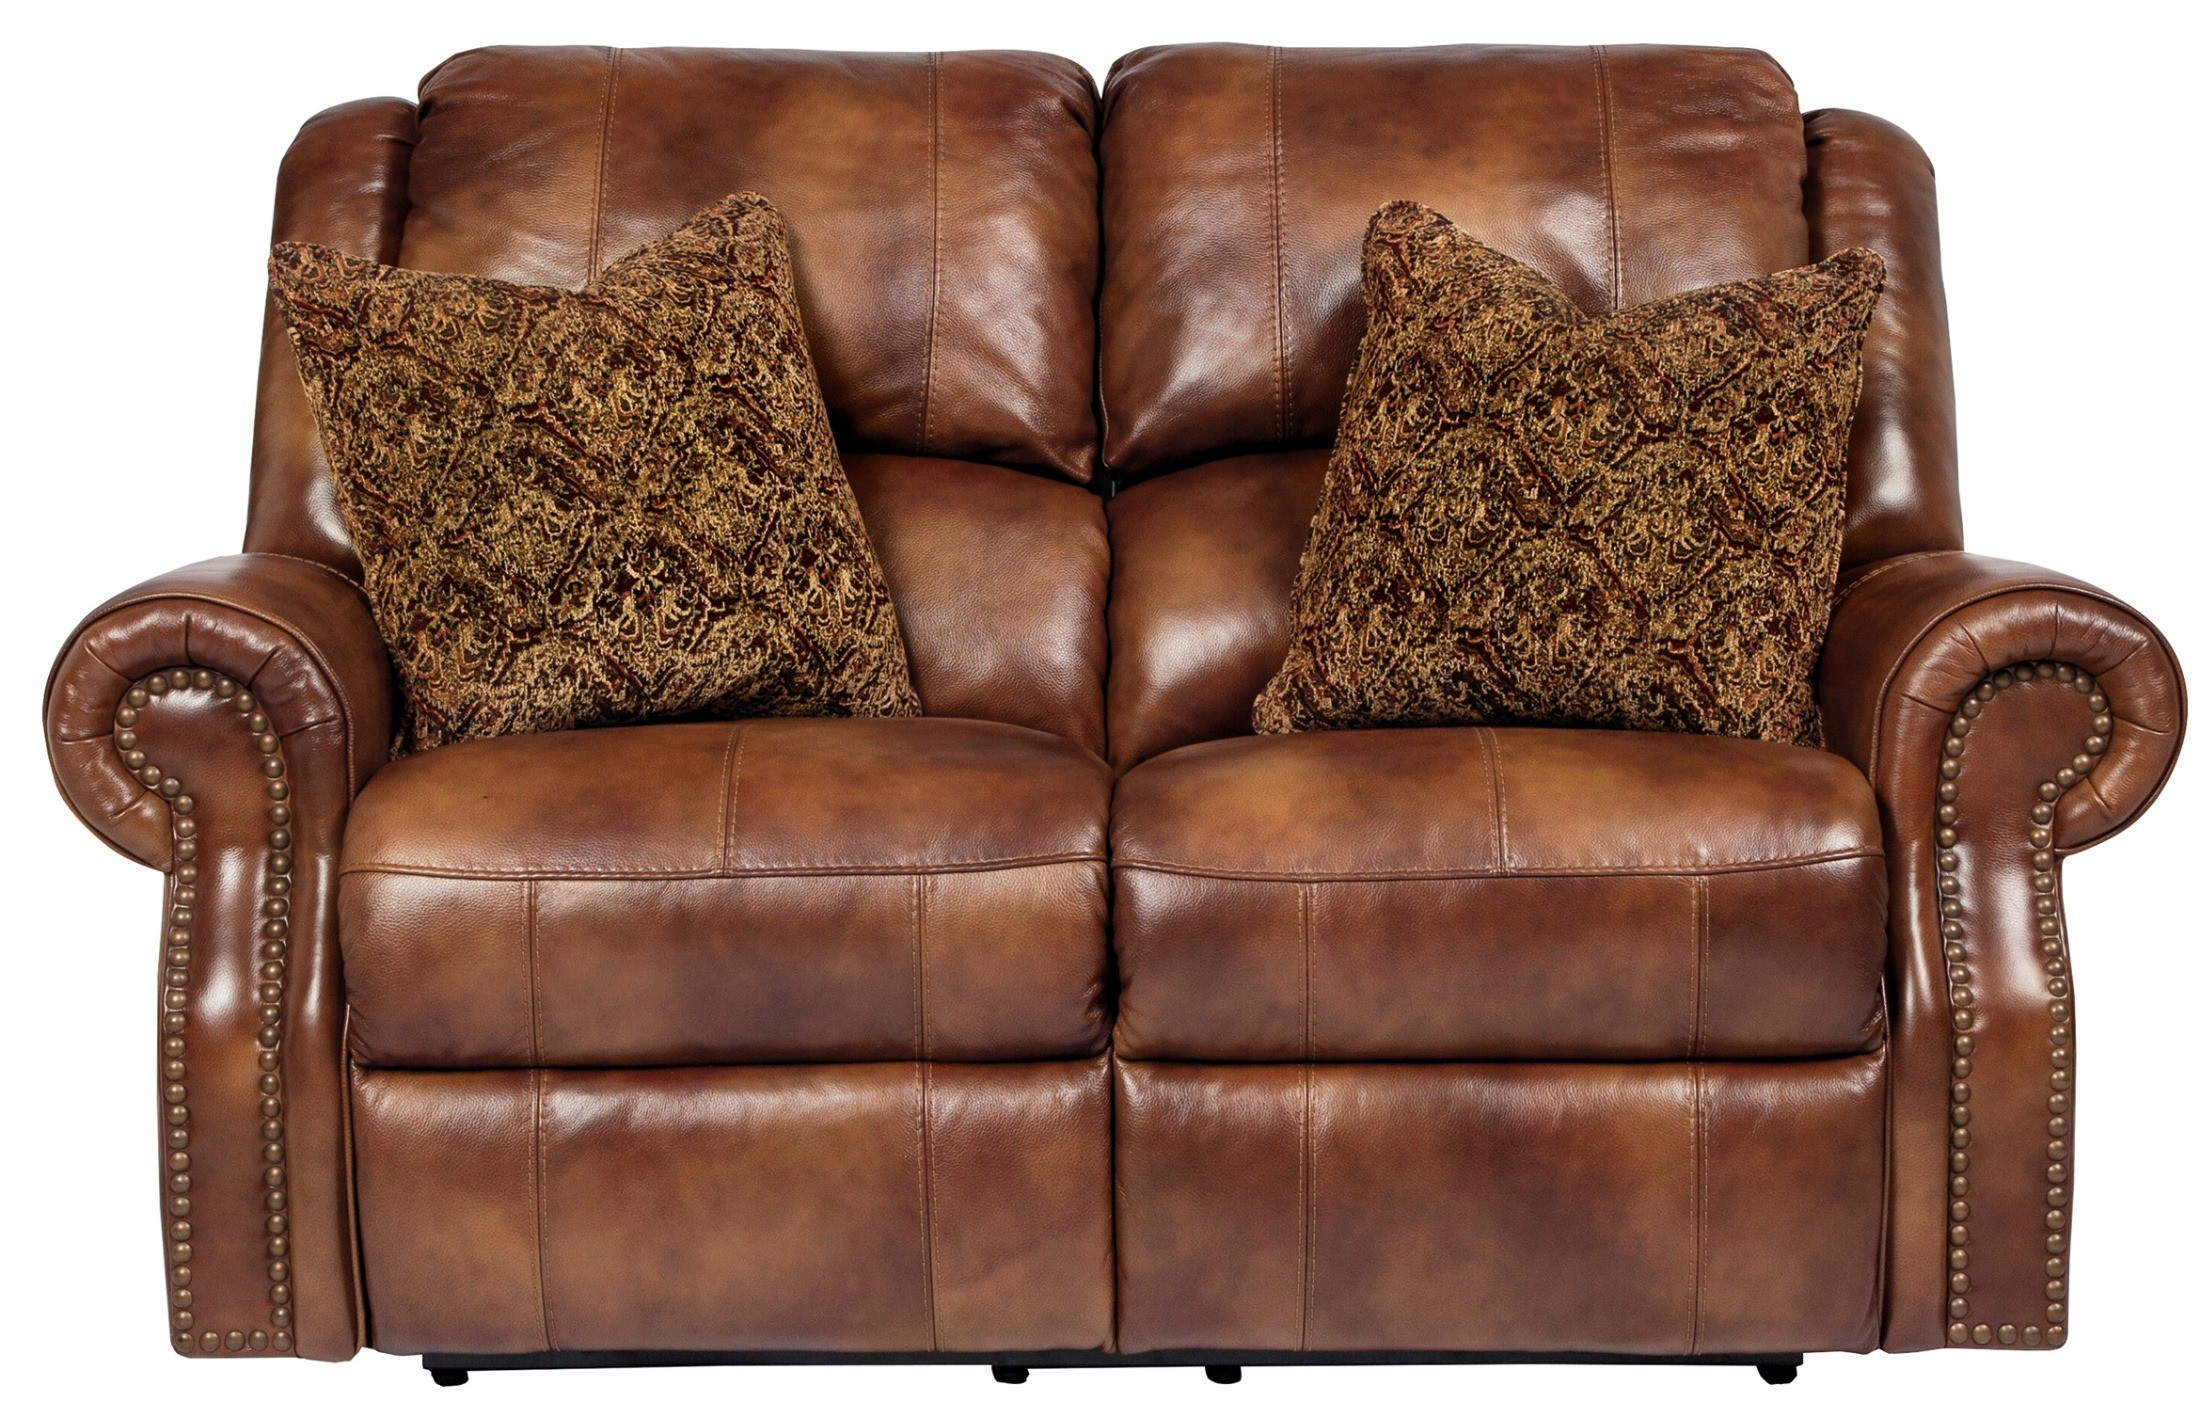 Walworth Auburn Power Reclining Living Room Set From